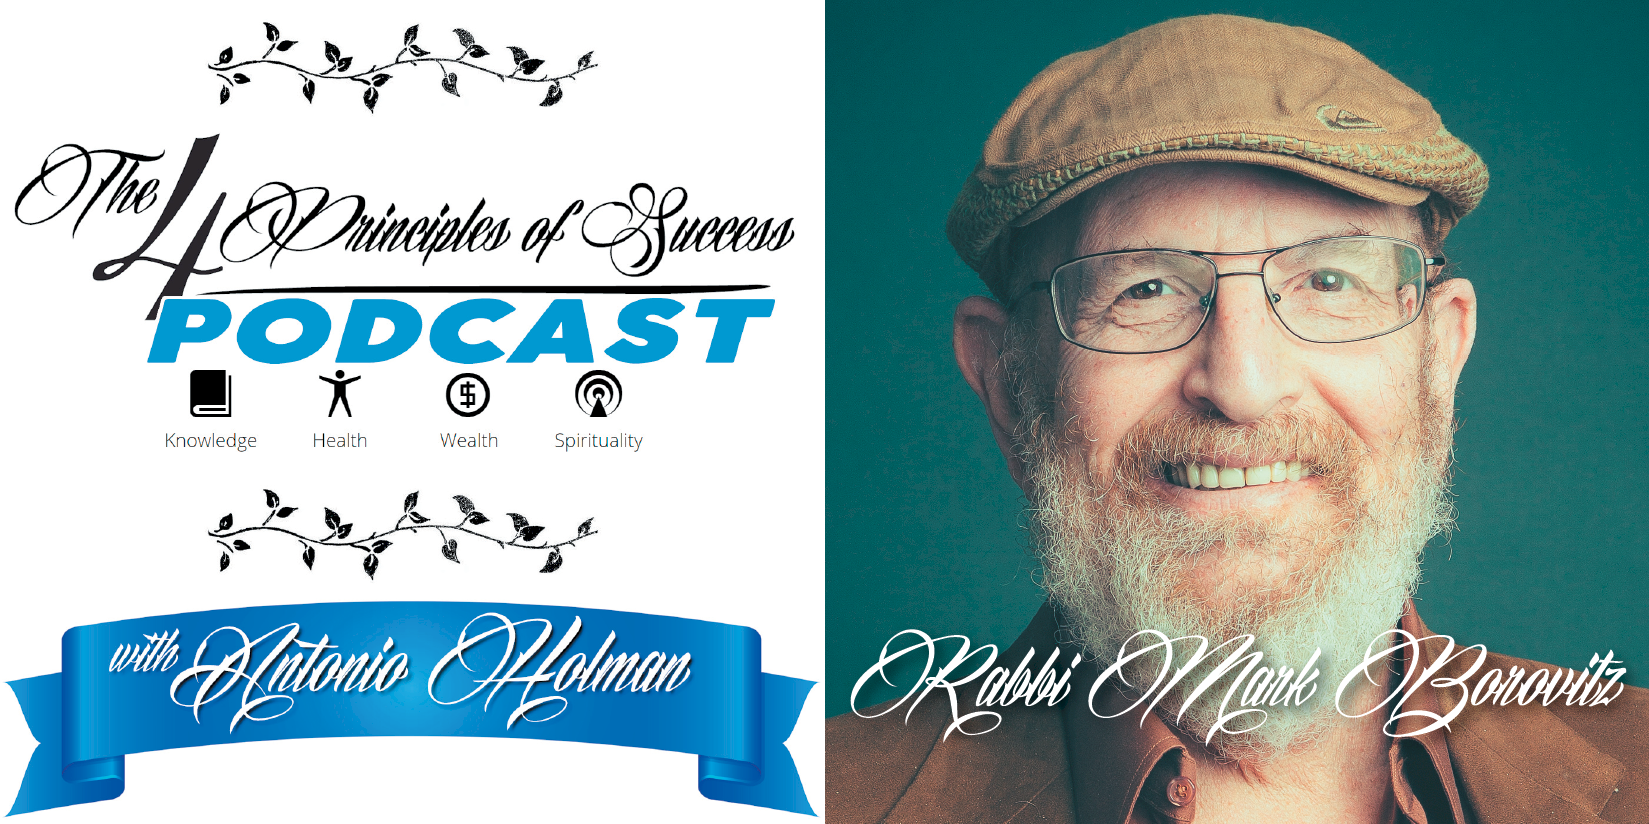 The 4 Principles of Success guest Rabbi Mark Borovitz